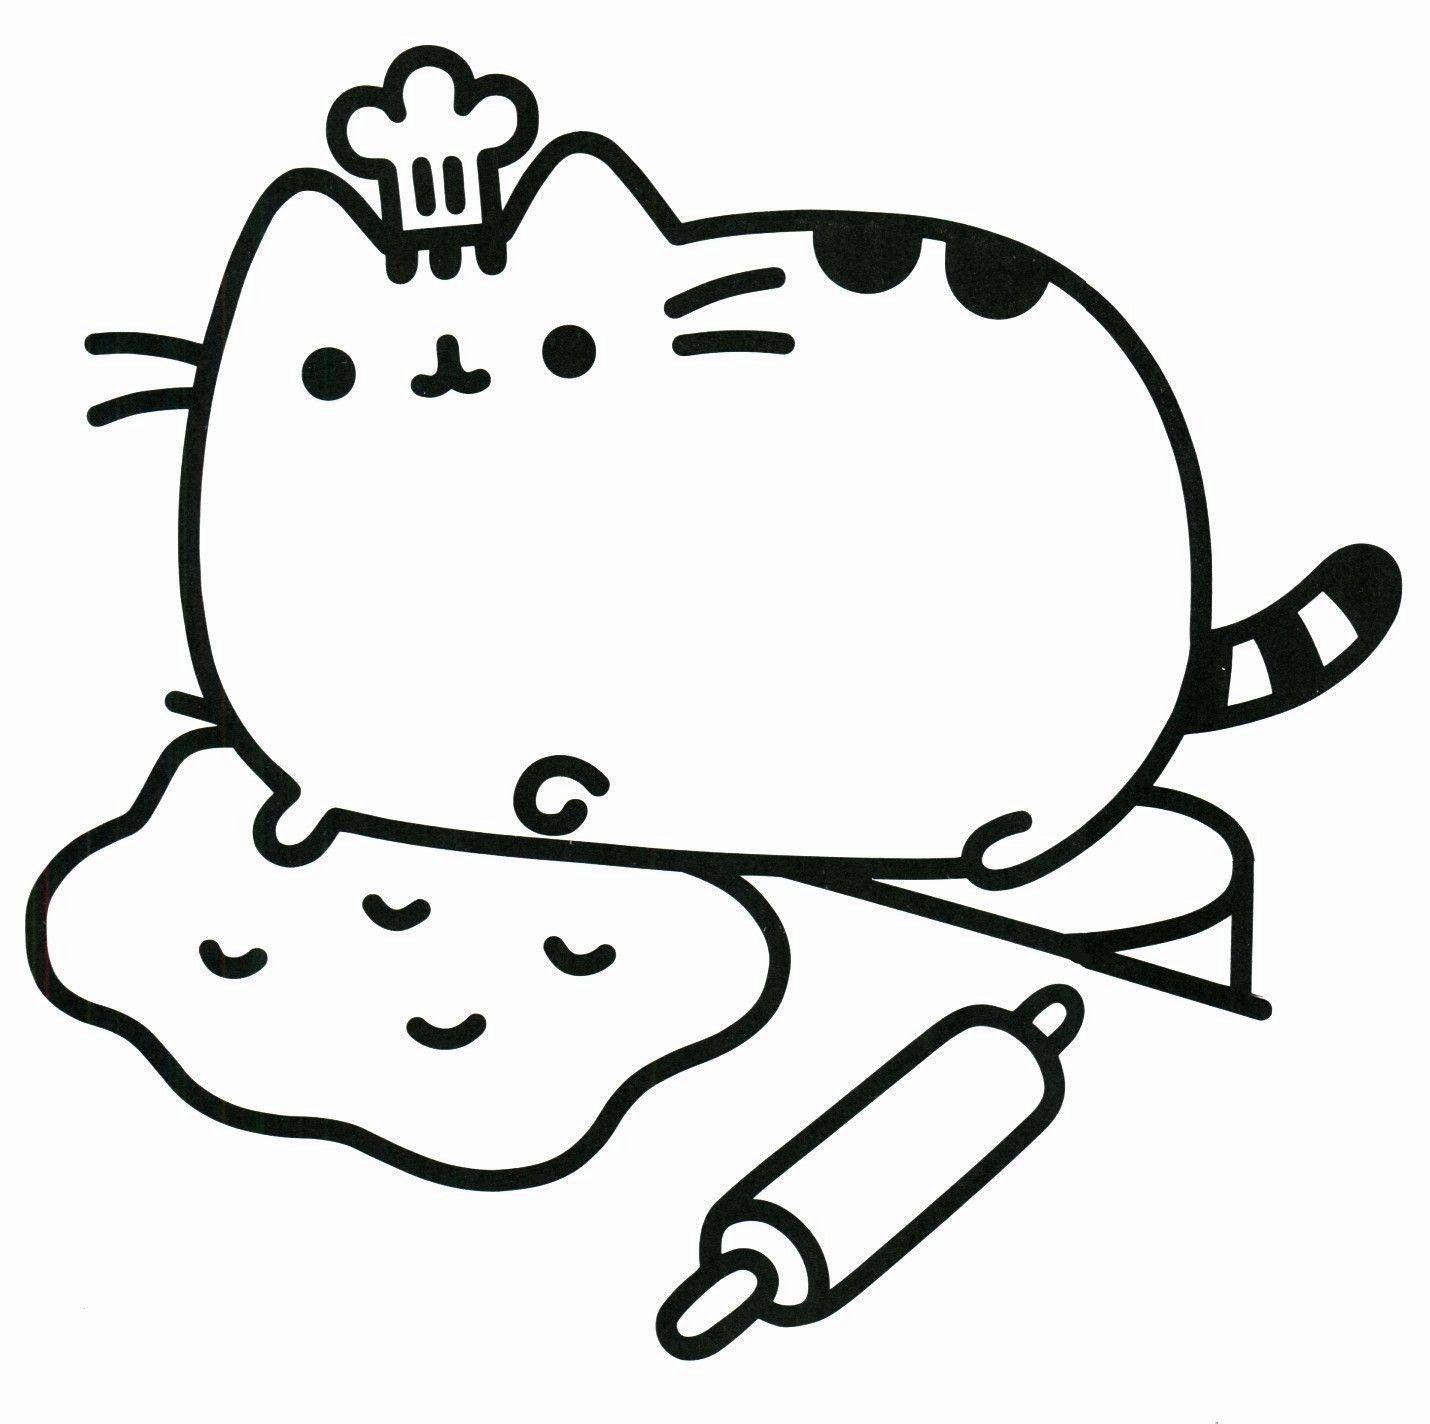 Coloring Pages Kawaii Animals Inspirational Awesome Cute Kawaii Food Coloring Pages Cat Coloring Page Food Coloring Pages Pusheen Coloring Pages